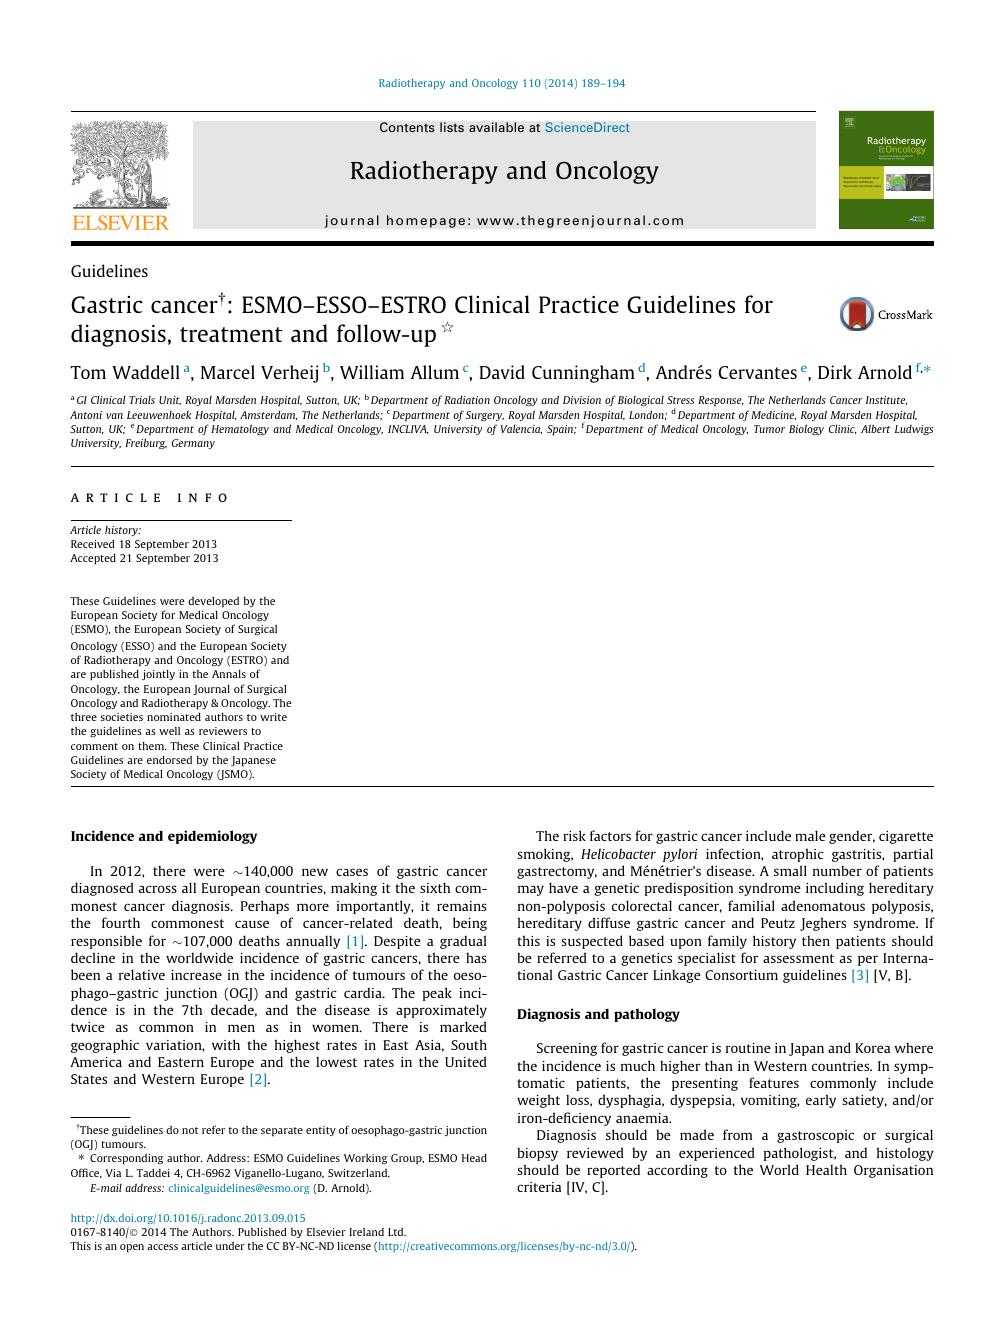 gastric cancer guideline esmo